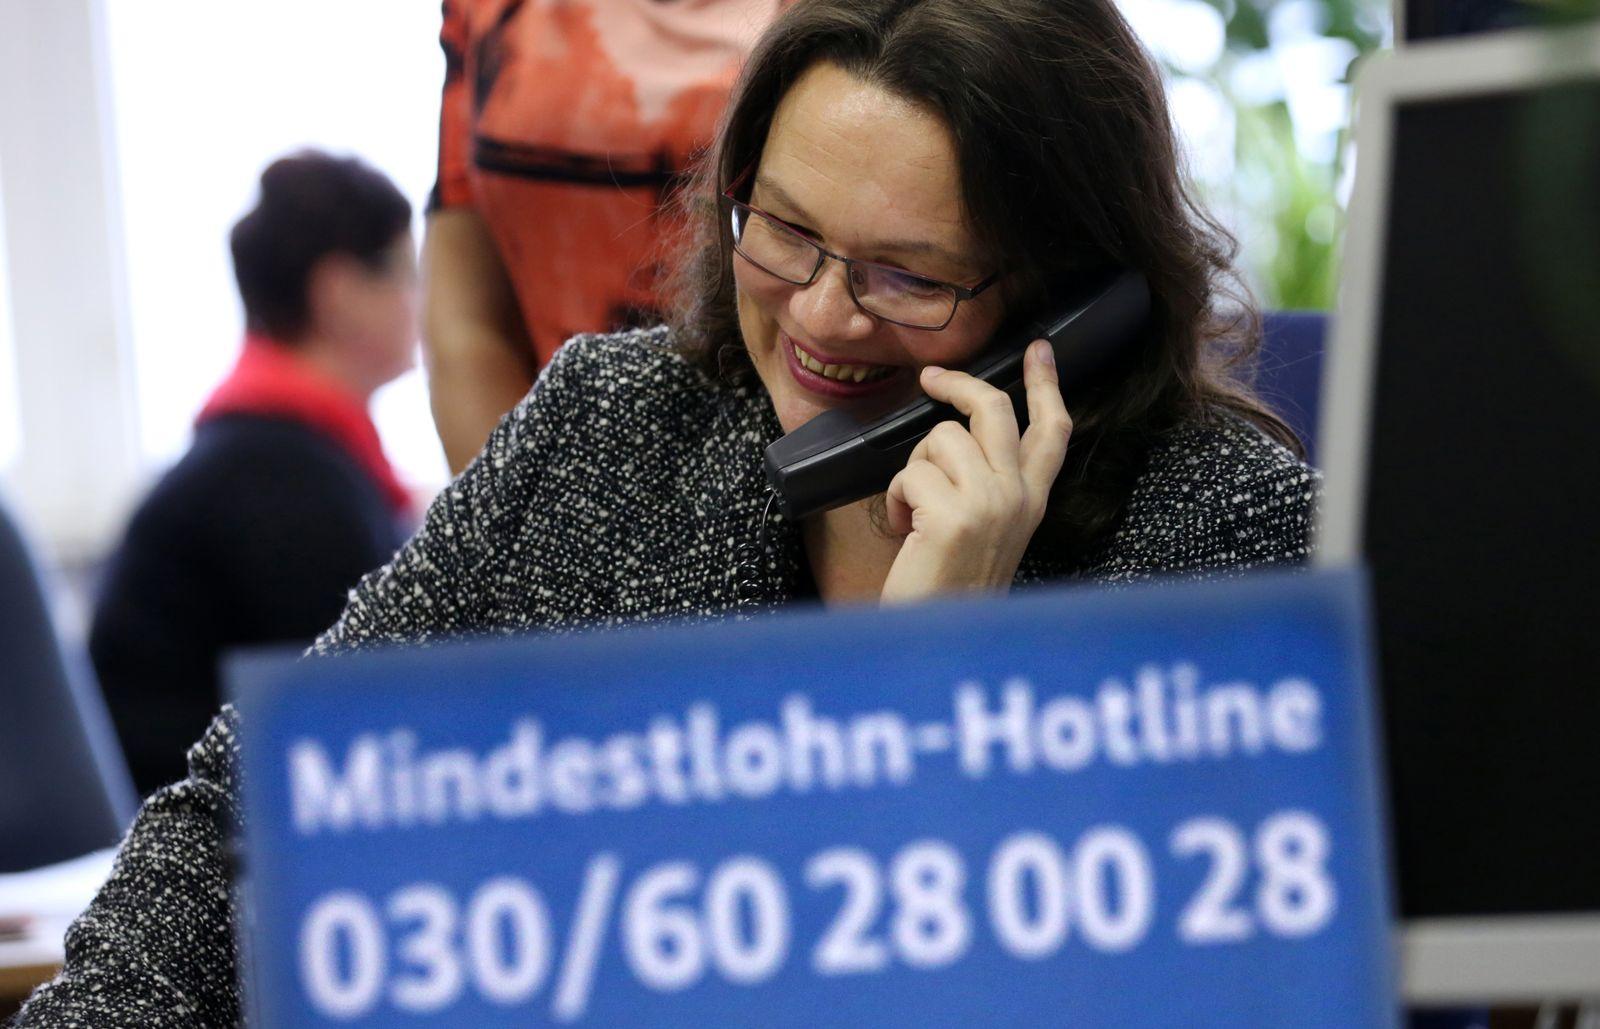 KaSP Bundesarbeitsministerin Nahles stellt Mindestlohn-Hotline vor